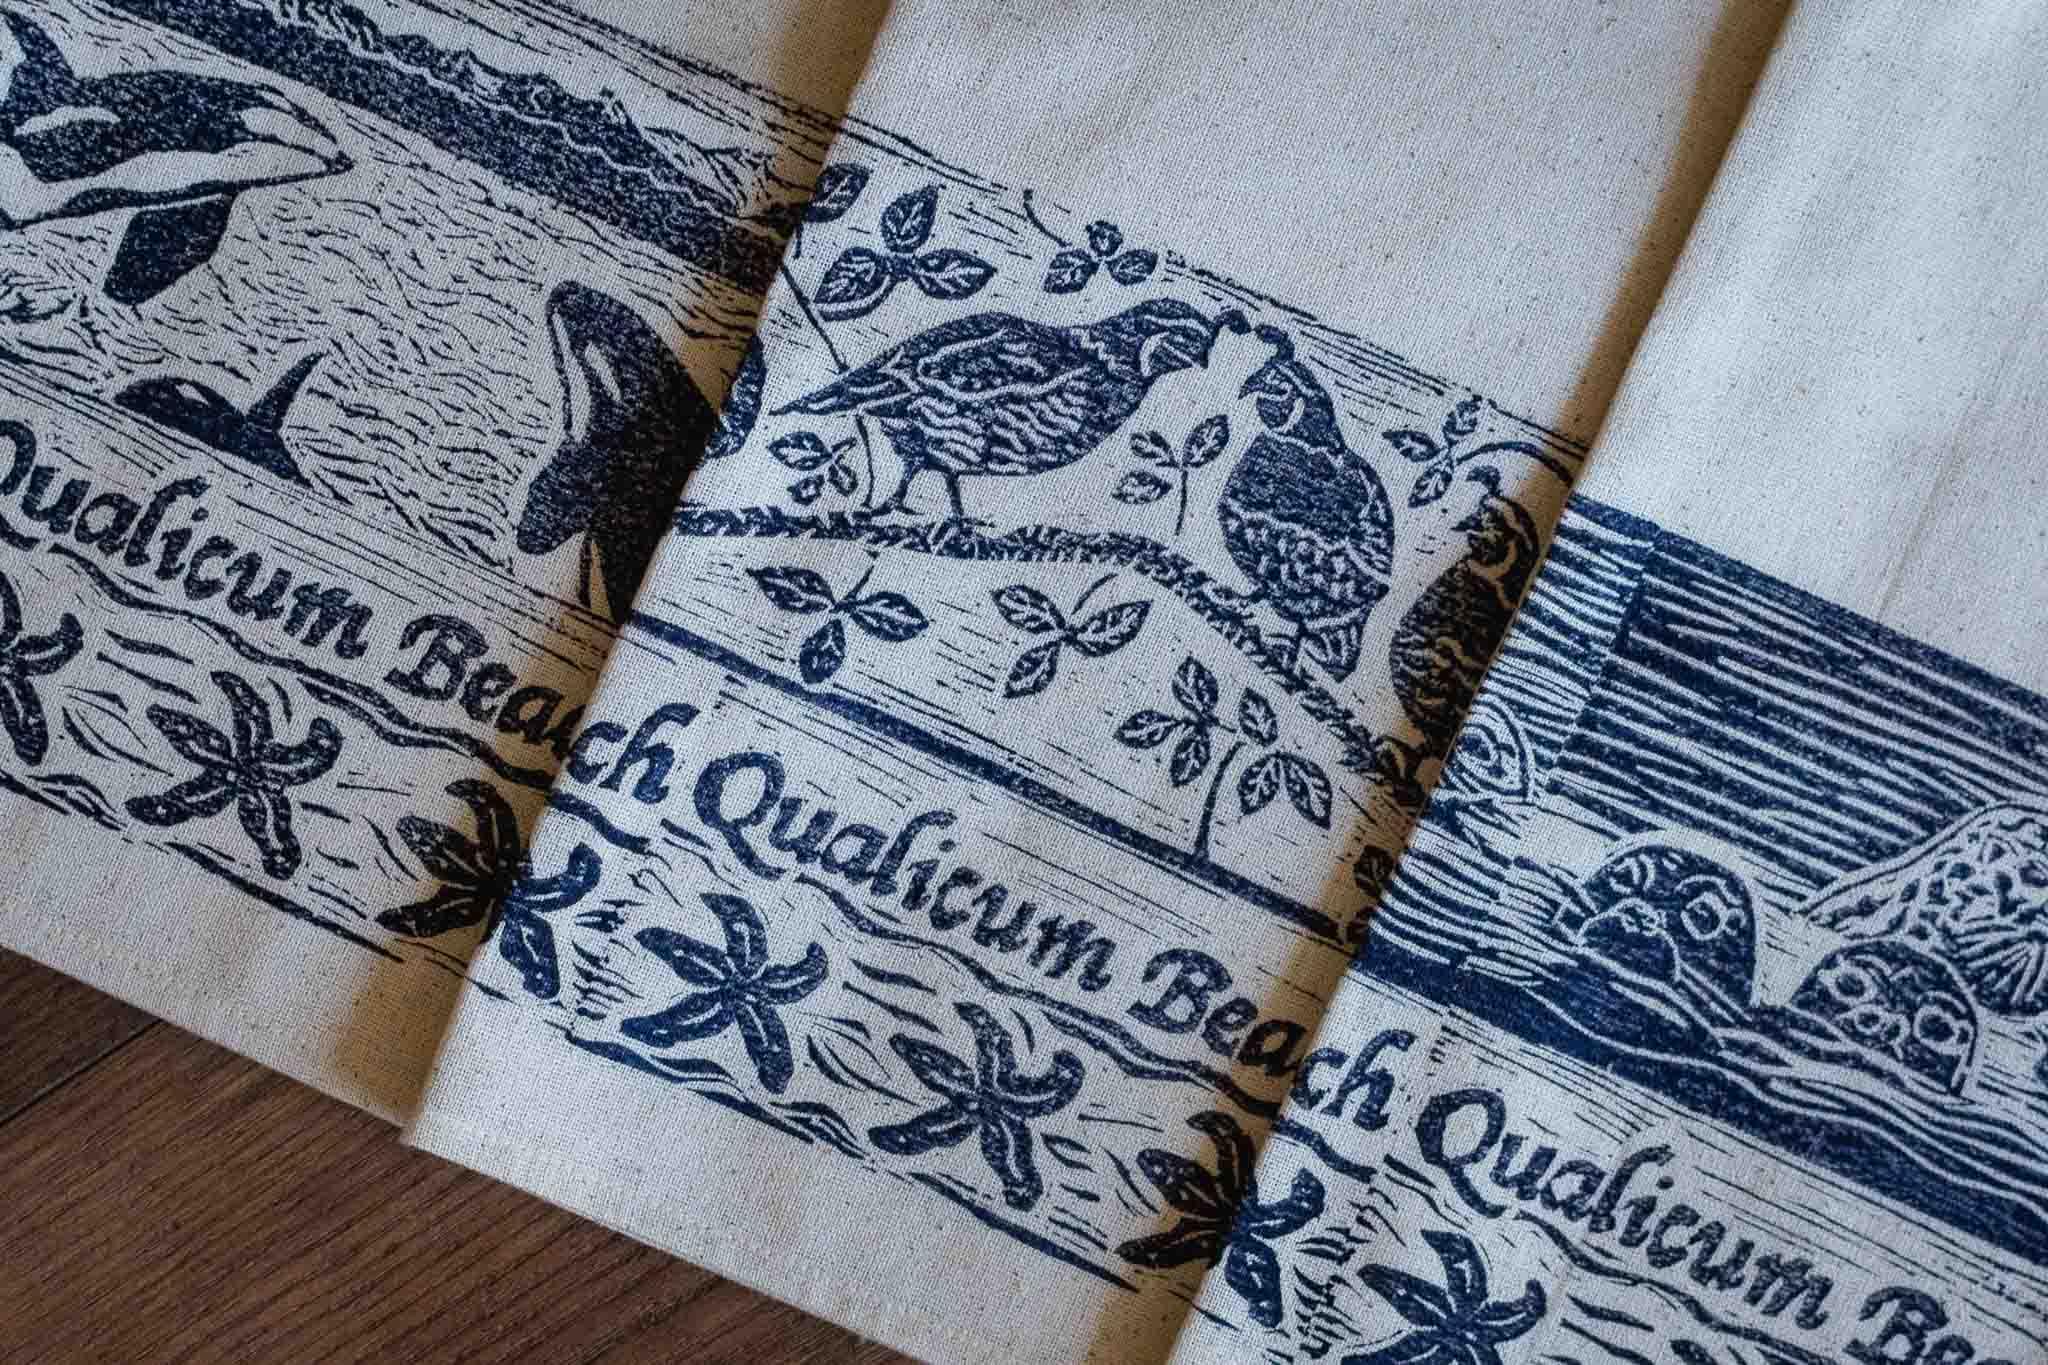 Handprinted Qualicum Beach Tea Towel by Maritime Blues